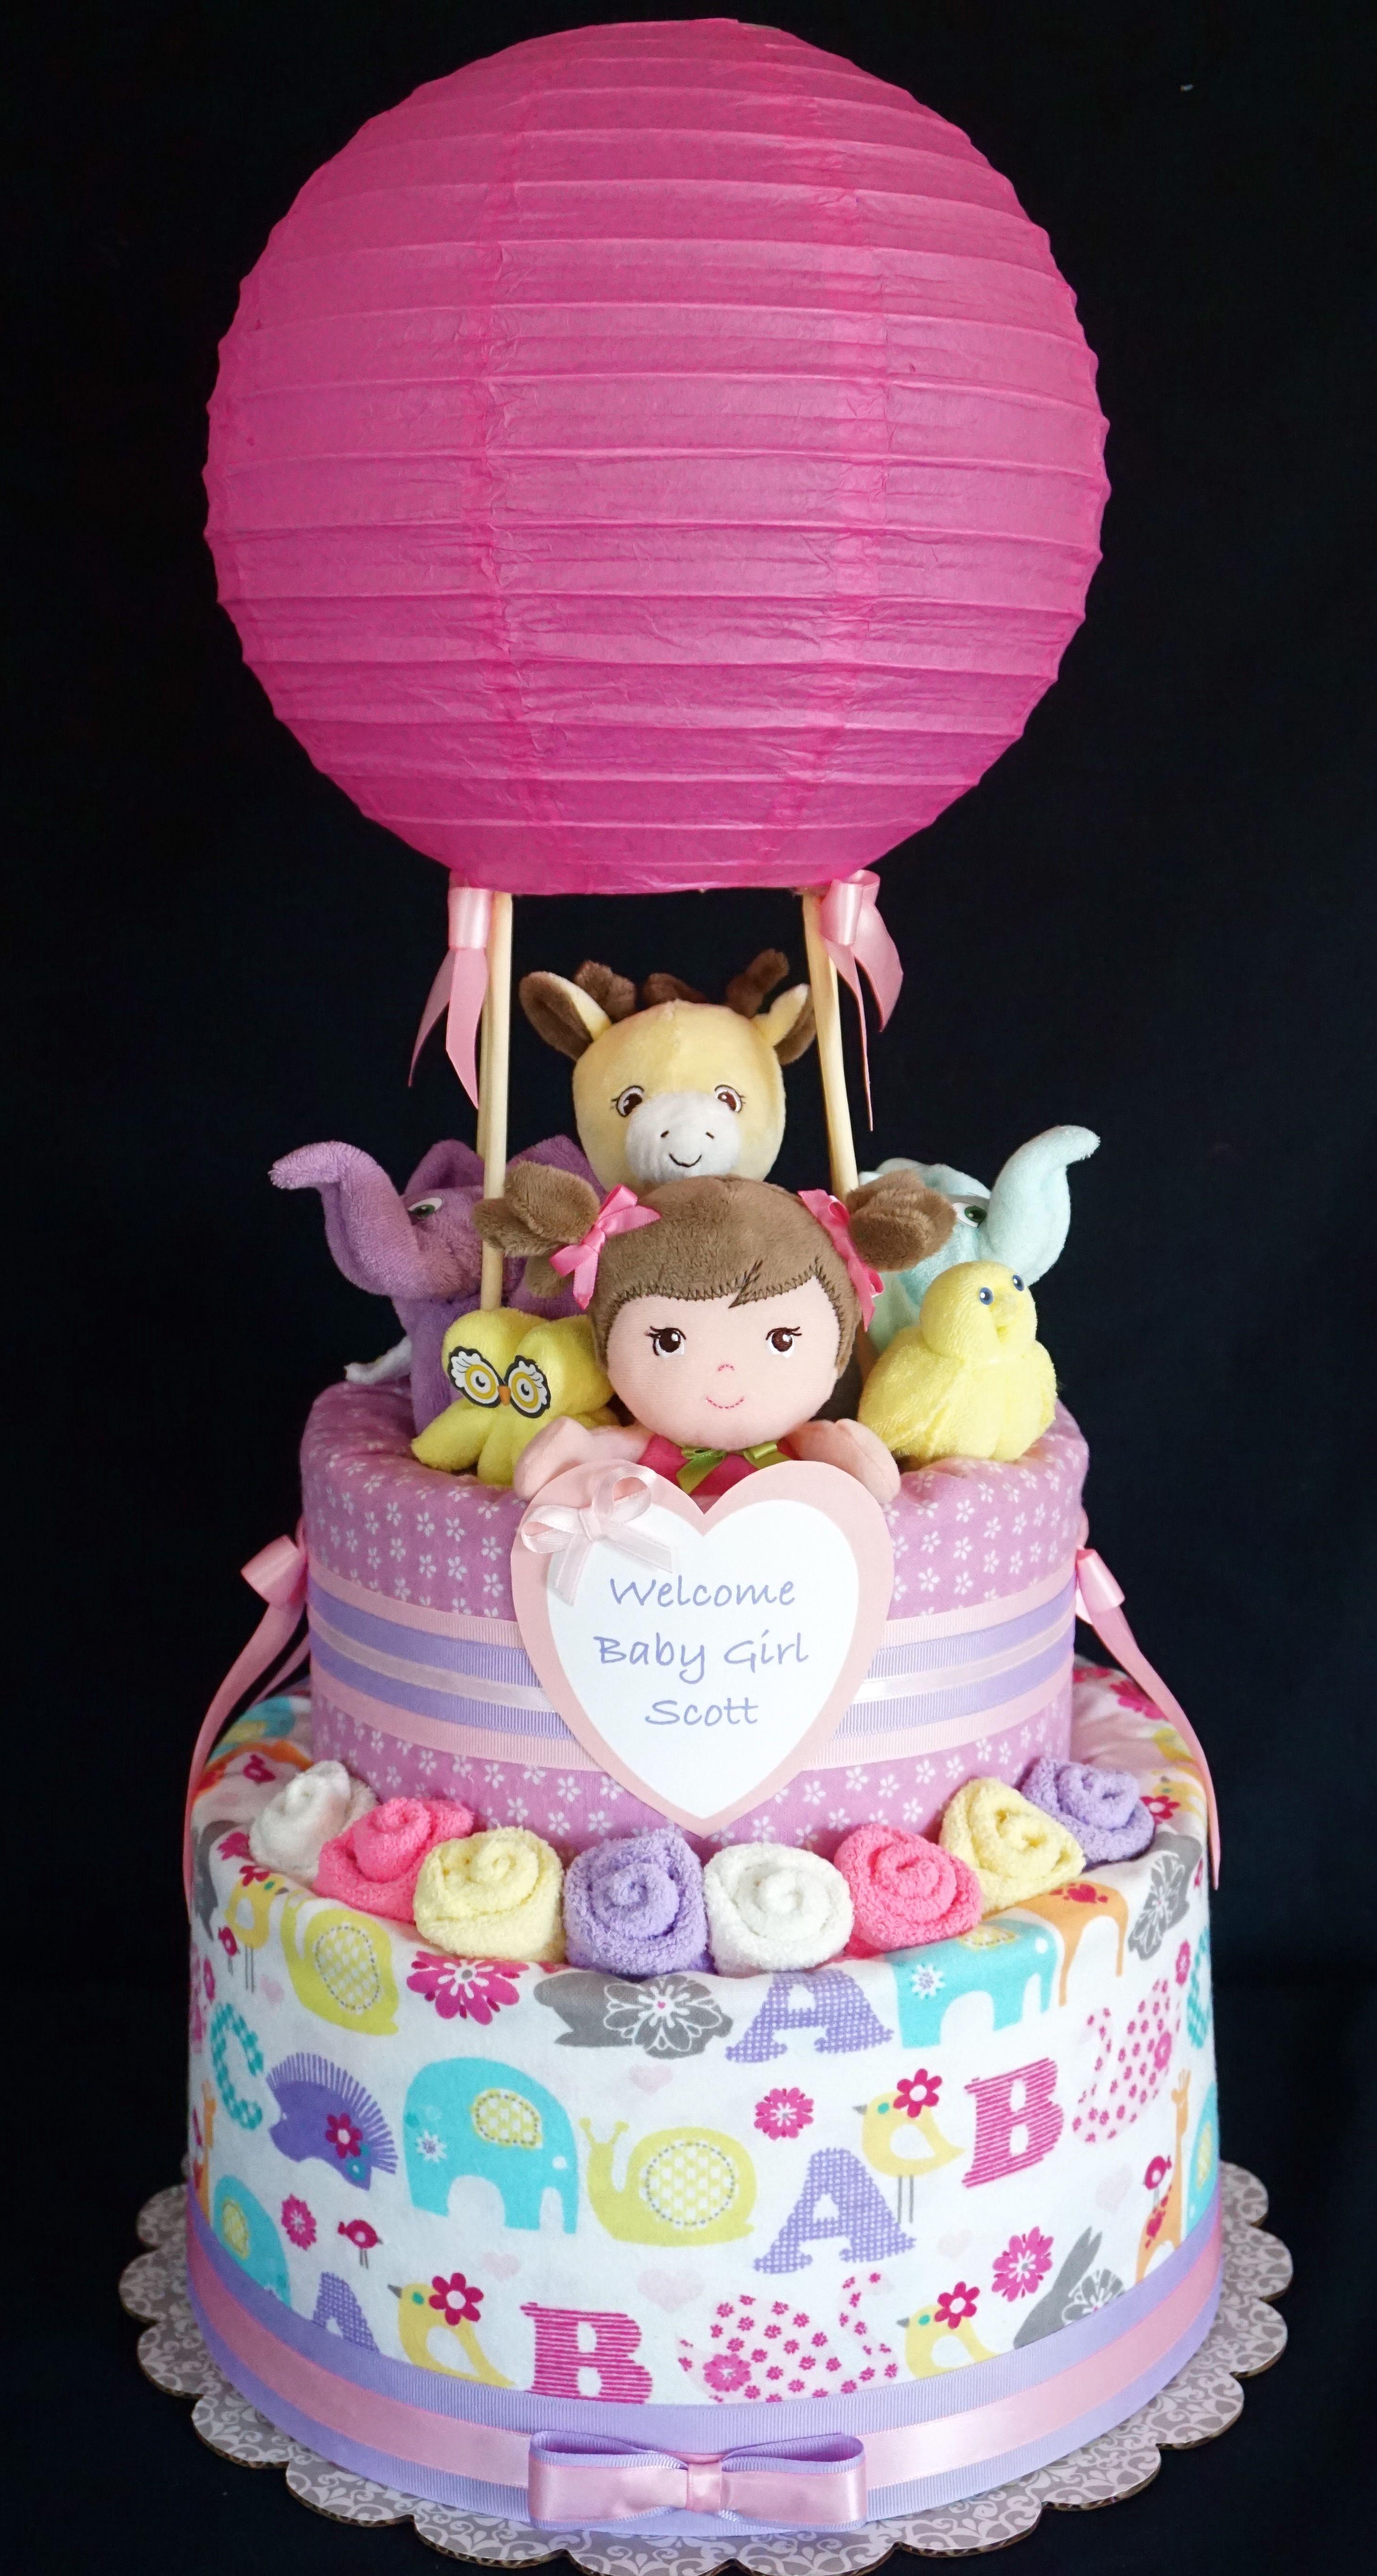 hot air balloon diaper cake diaper cakes pinterest hot. Black Bedroom Furniture Sets. Home Design Ideas